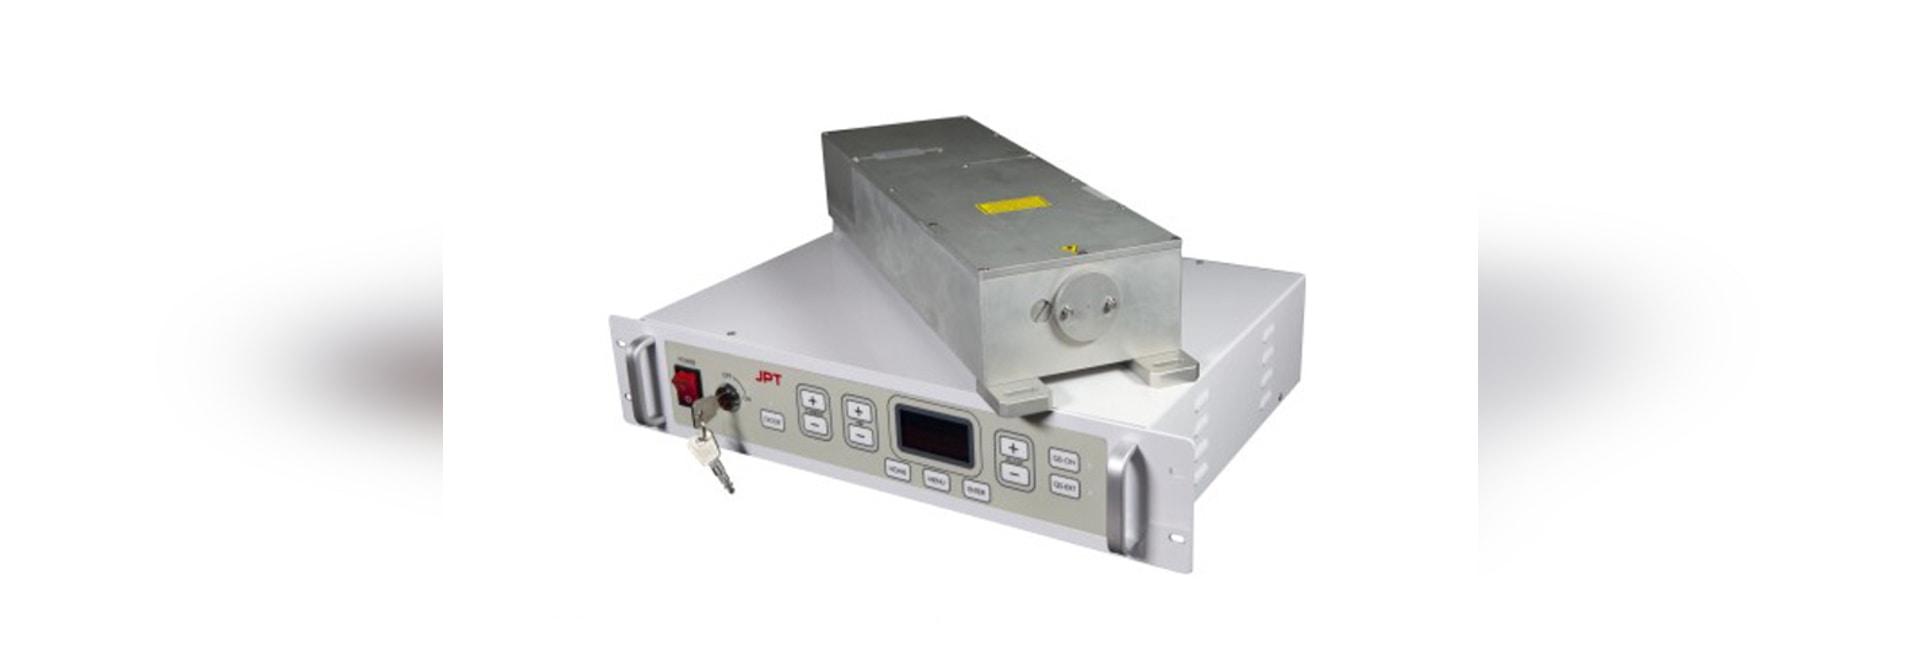 La fibra de JPT bombeó la fuente de laser ultravioleta